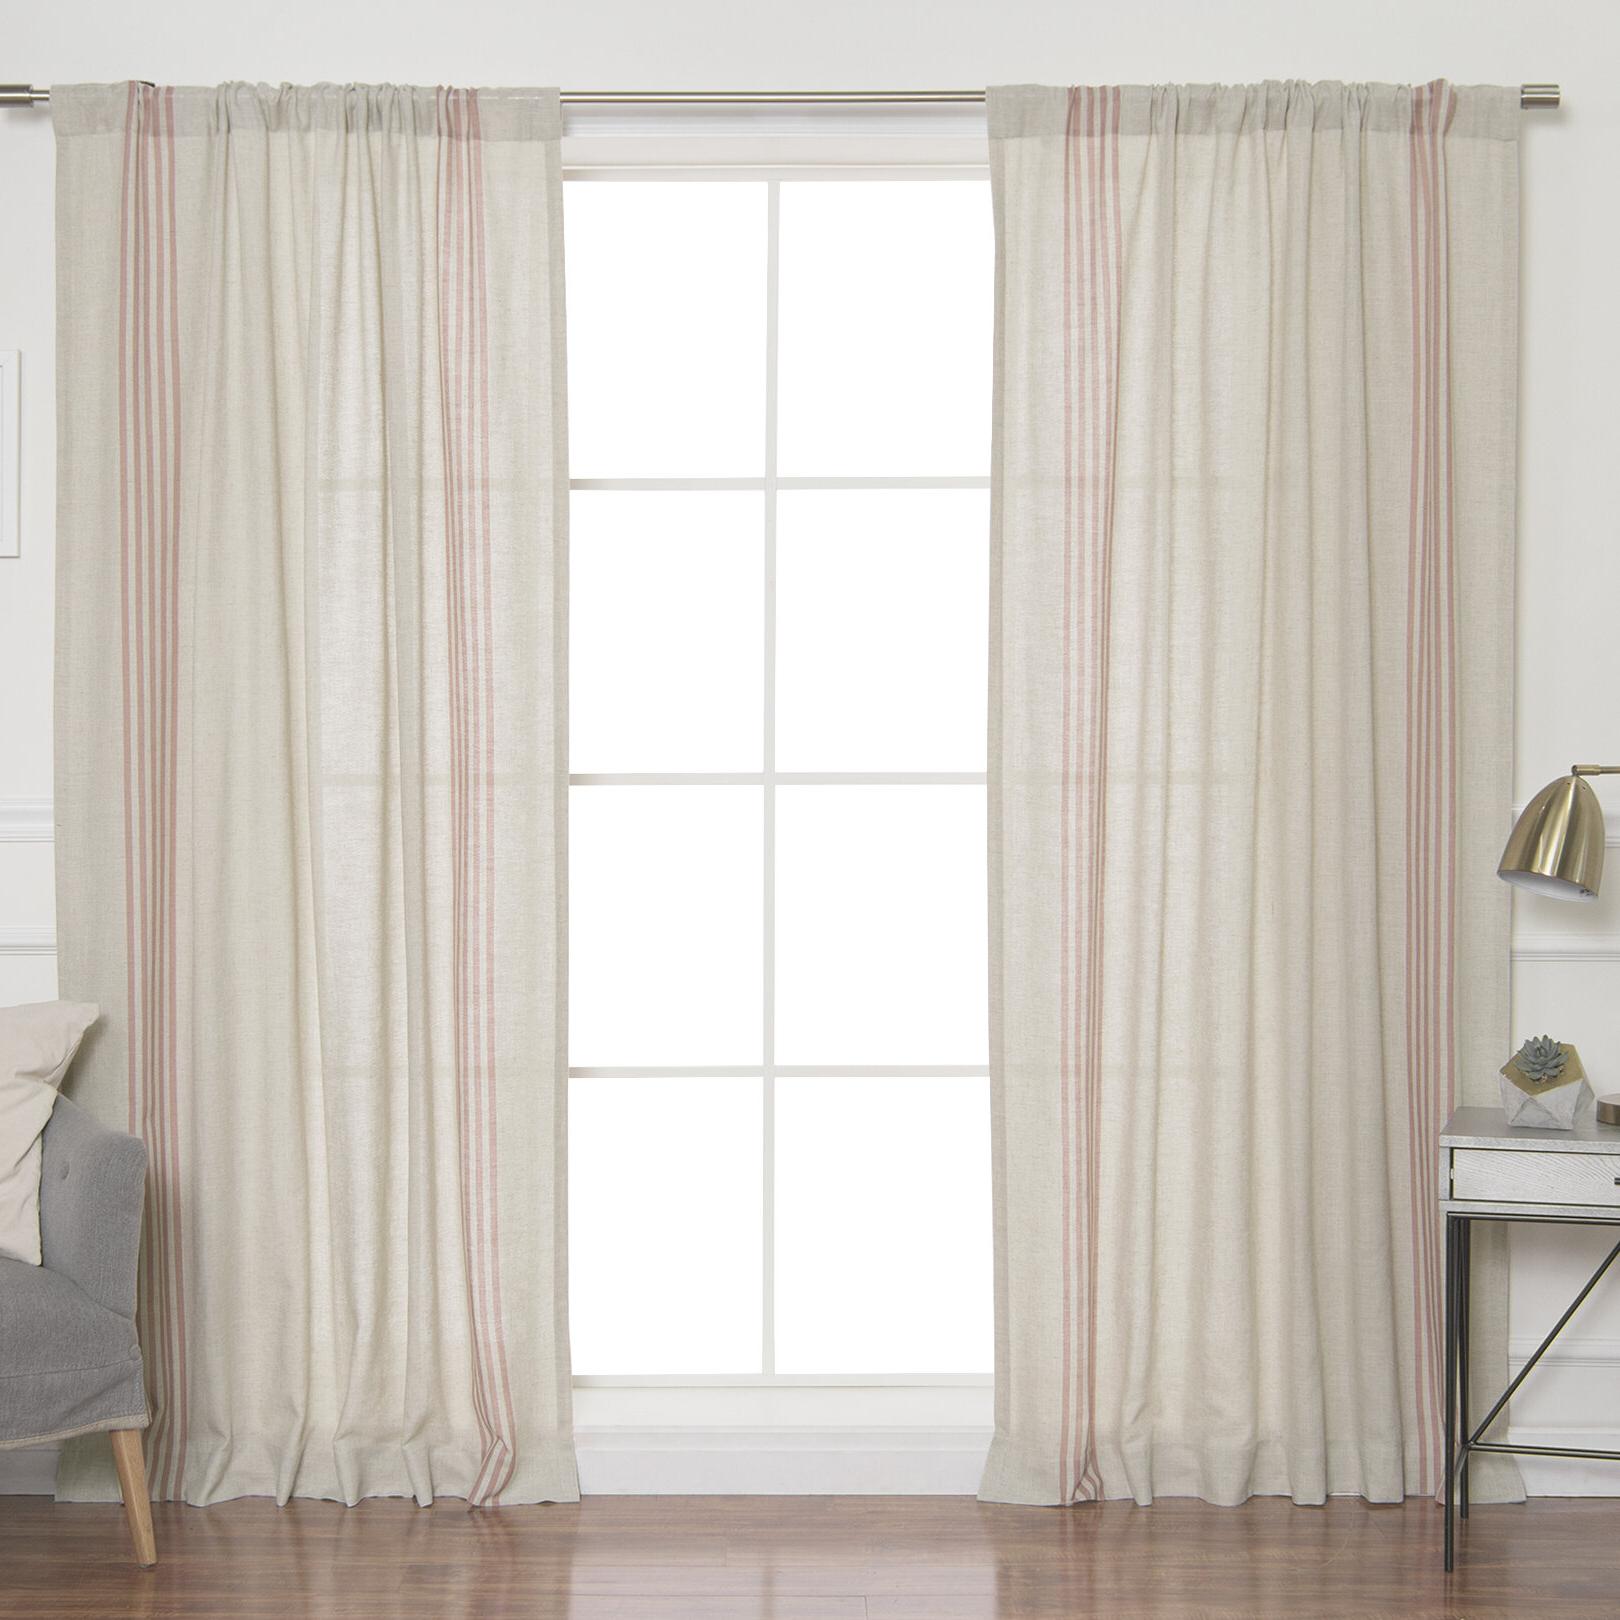 Ivory Micro Striped Semi Sheer Window Curtain Pieces Regarding Trendy Bateman Striped Sheer Rod Pocket Curtain Panels (View 15 of 20)